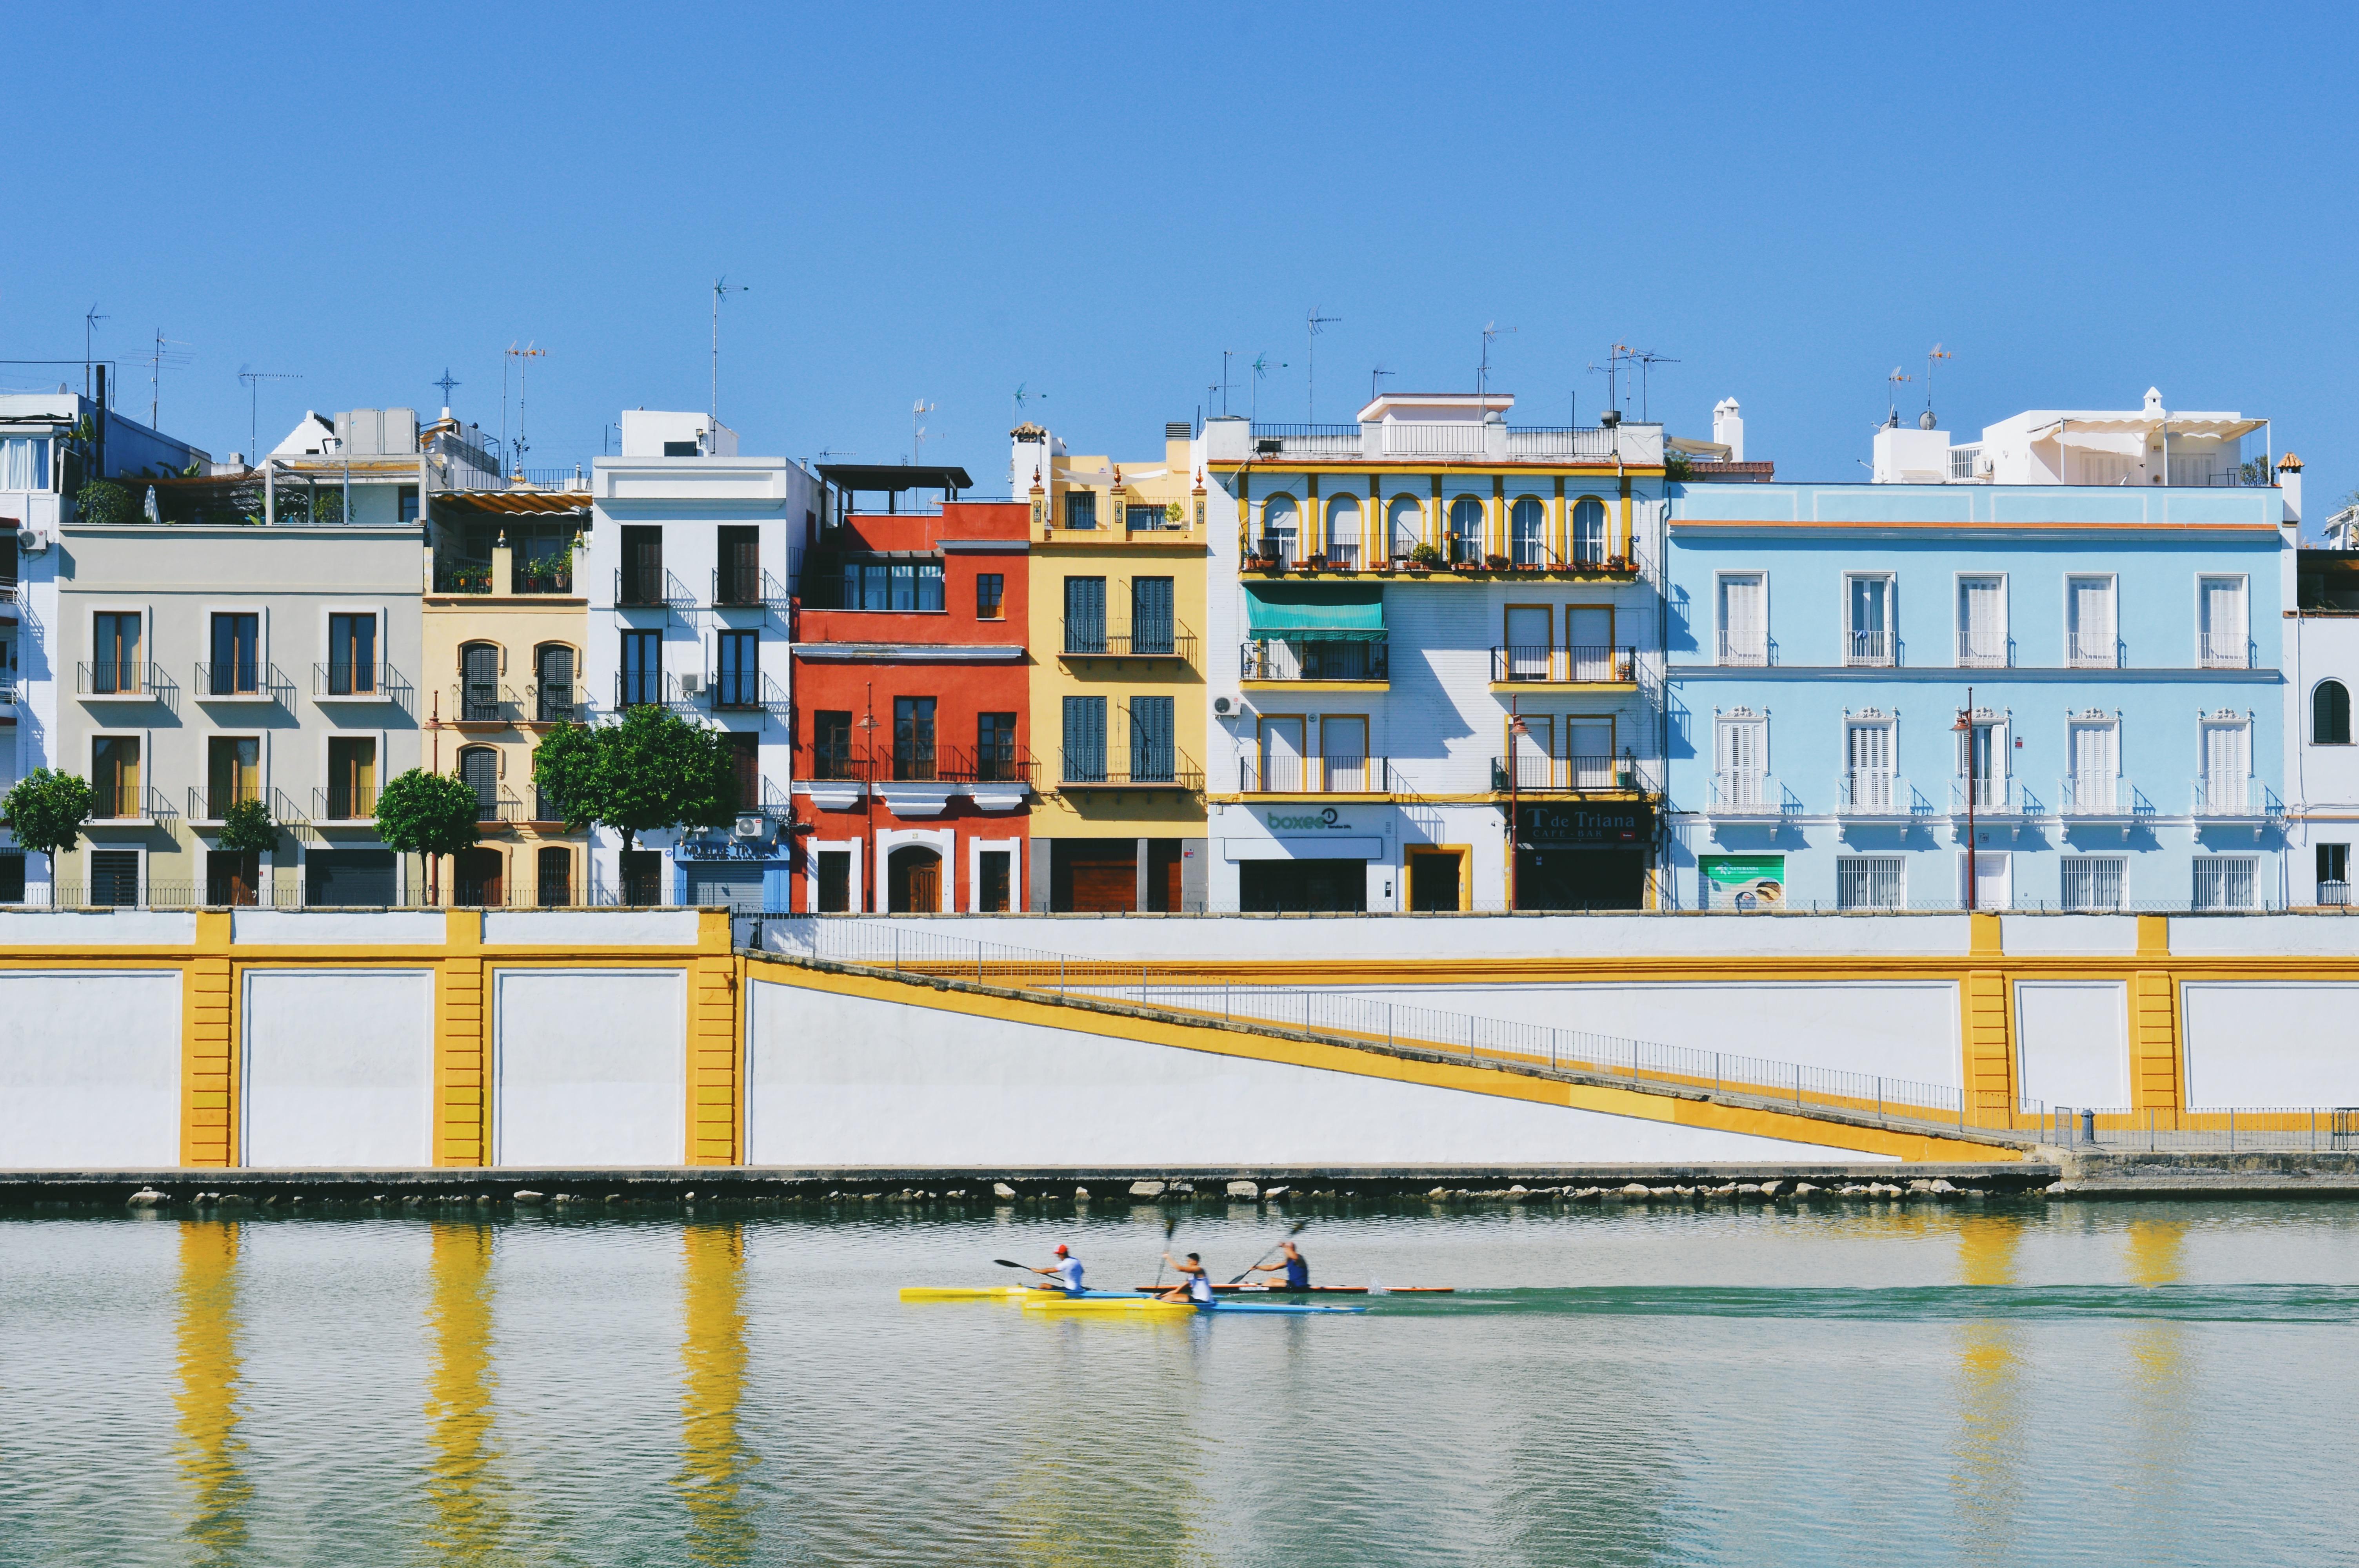 Triana Neighbourhood above the Guadalquivir